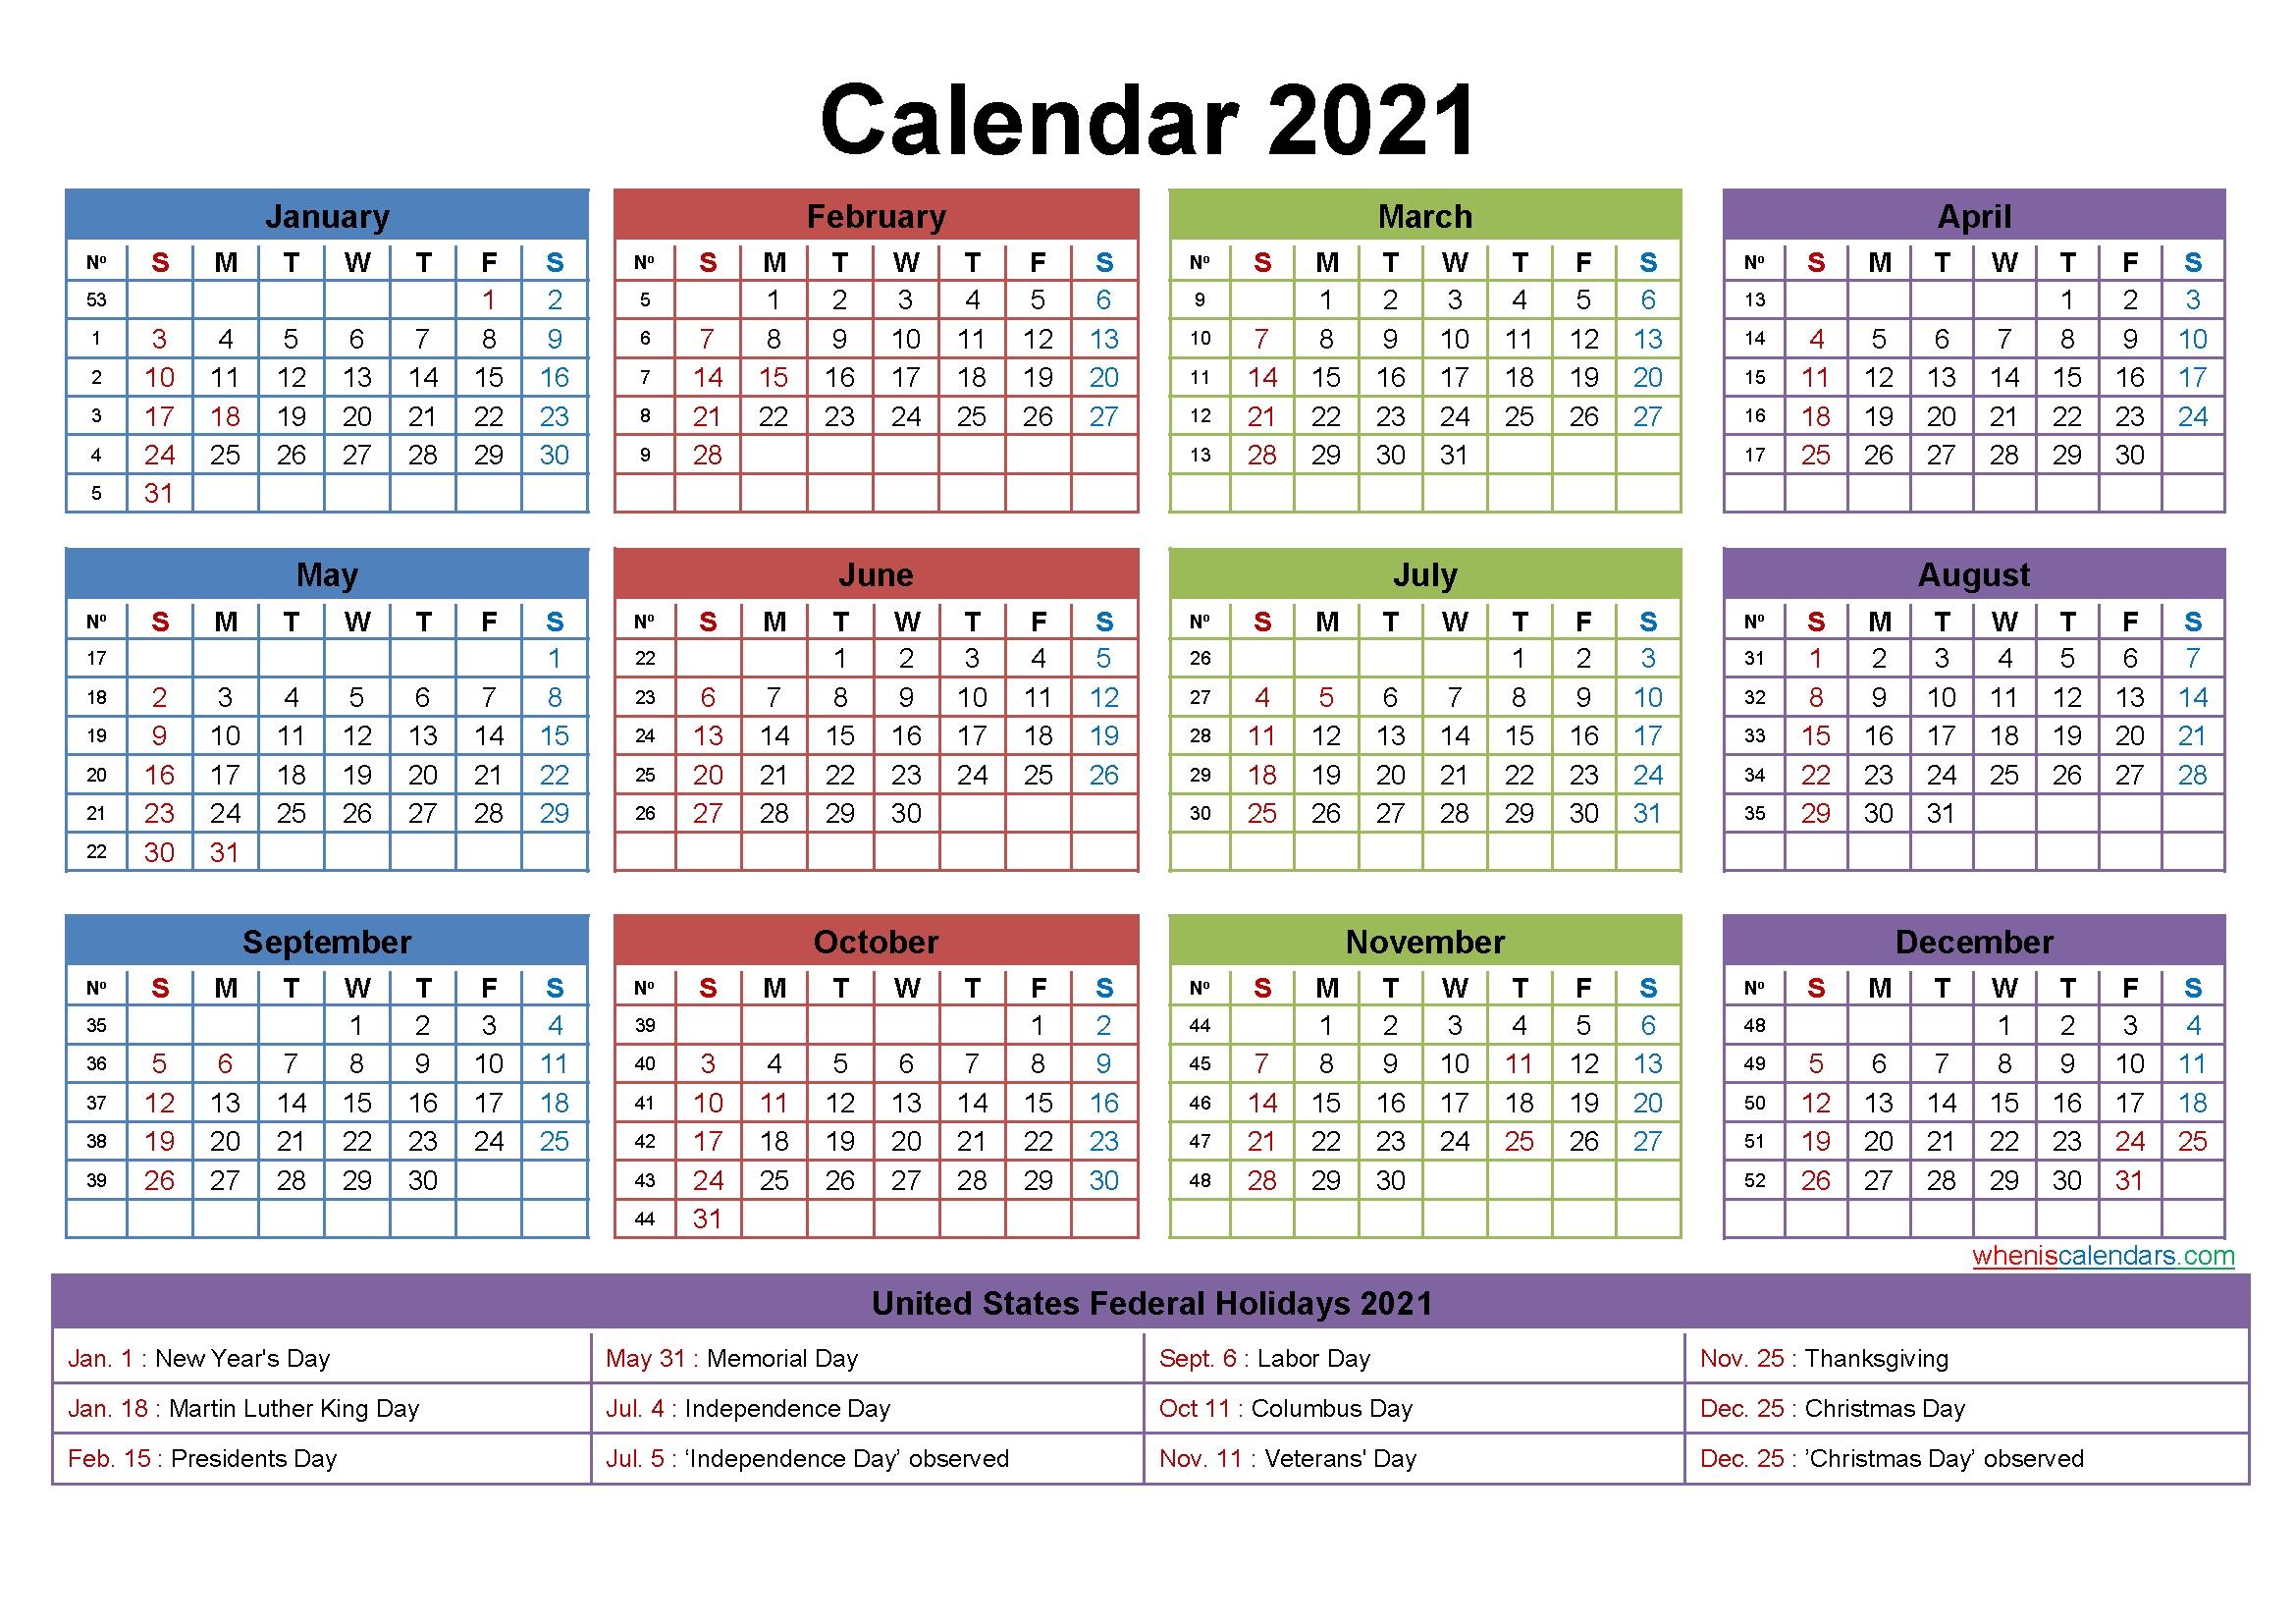 Free Editable Weekly 2021 Calendar - Free Printable 2021 Calendar: Includes Editable Version